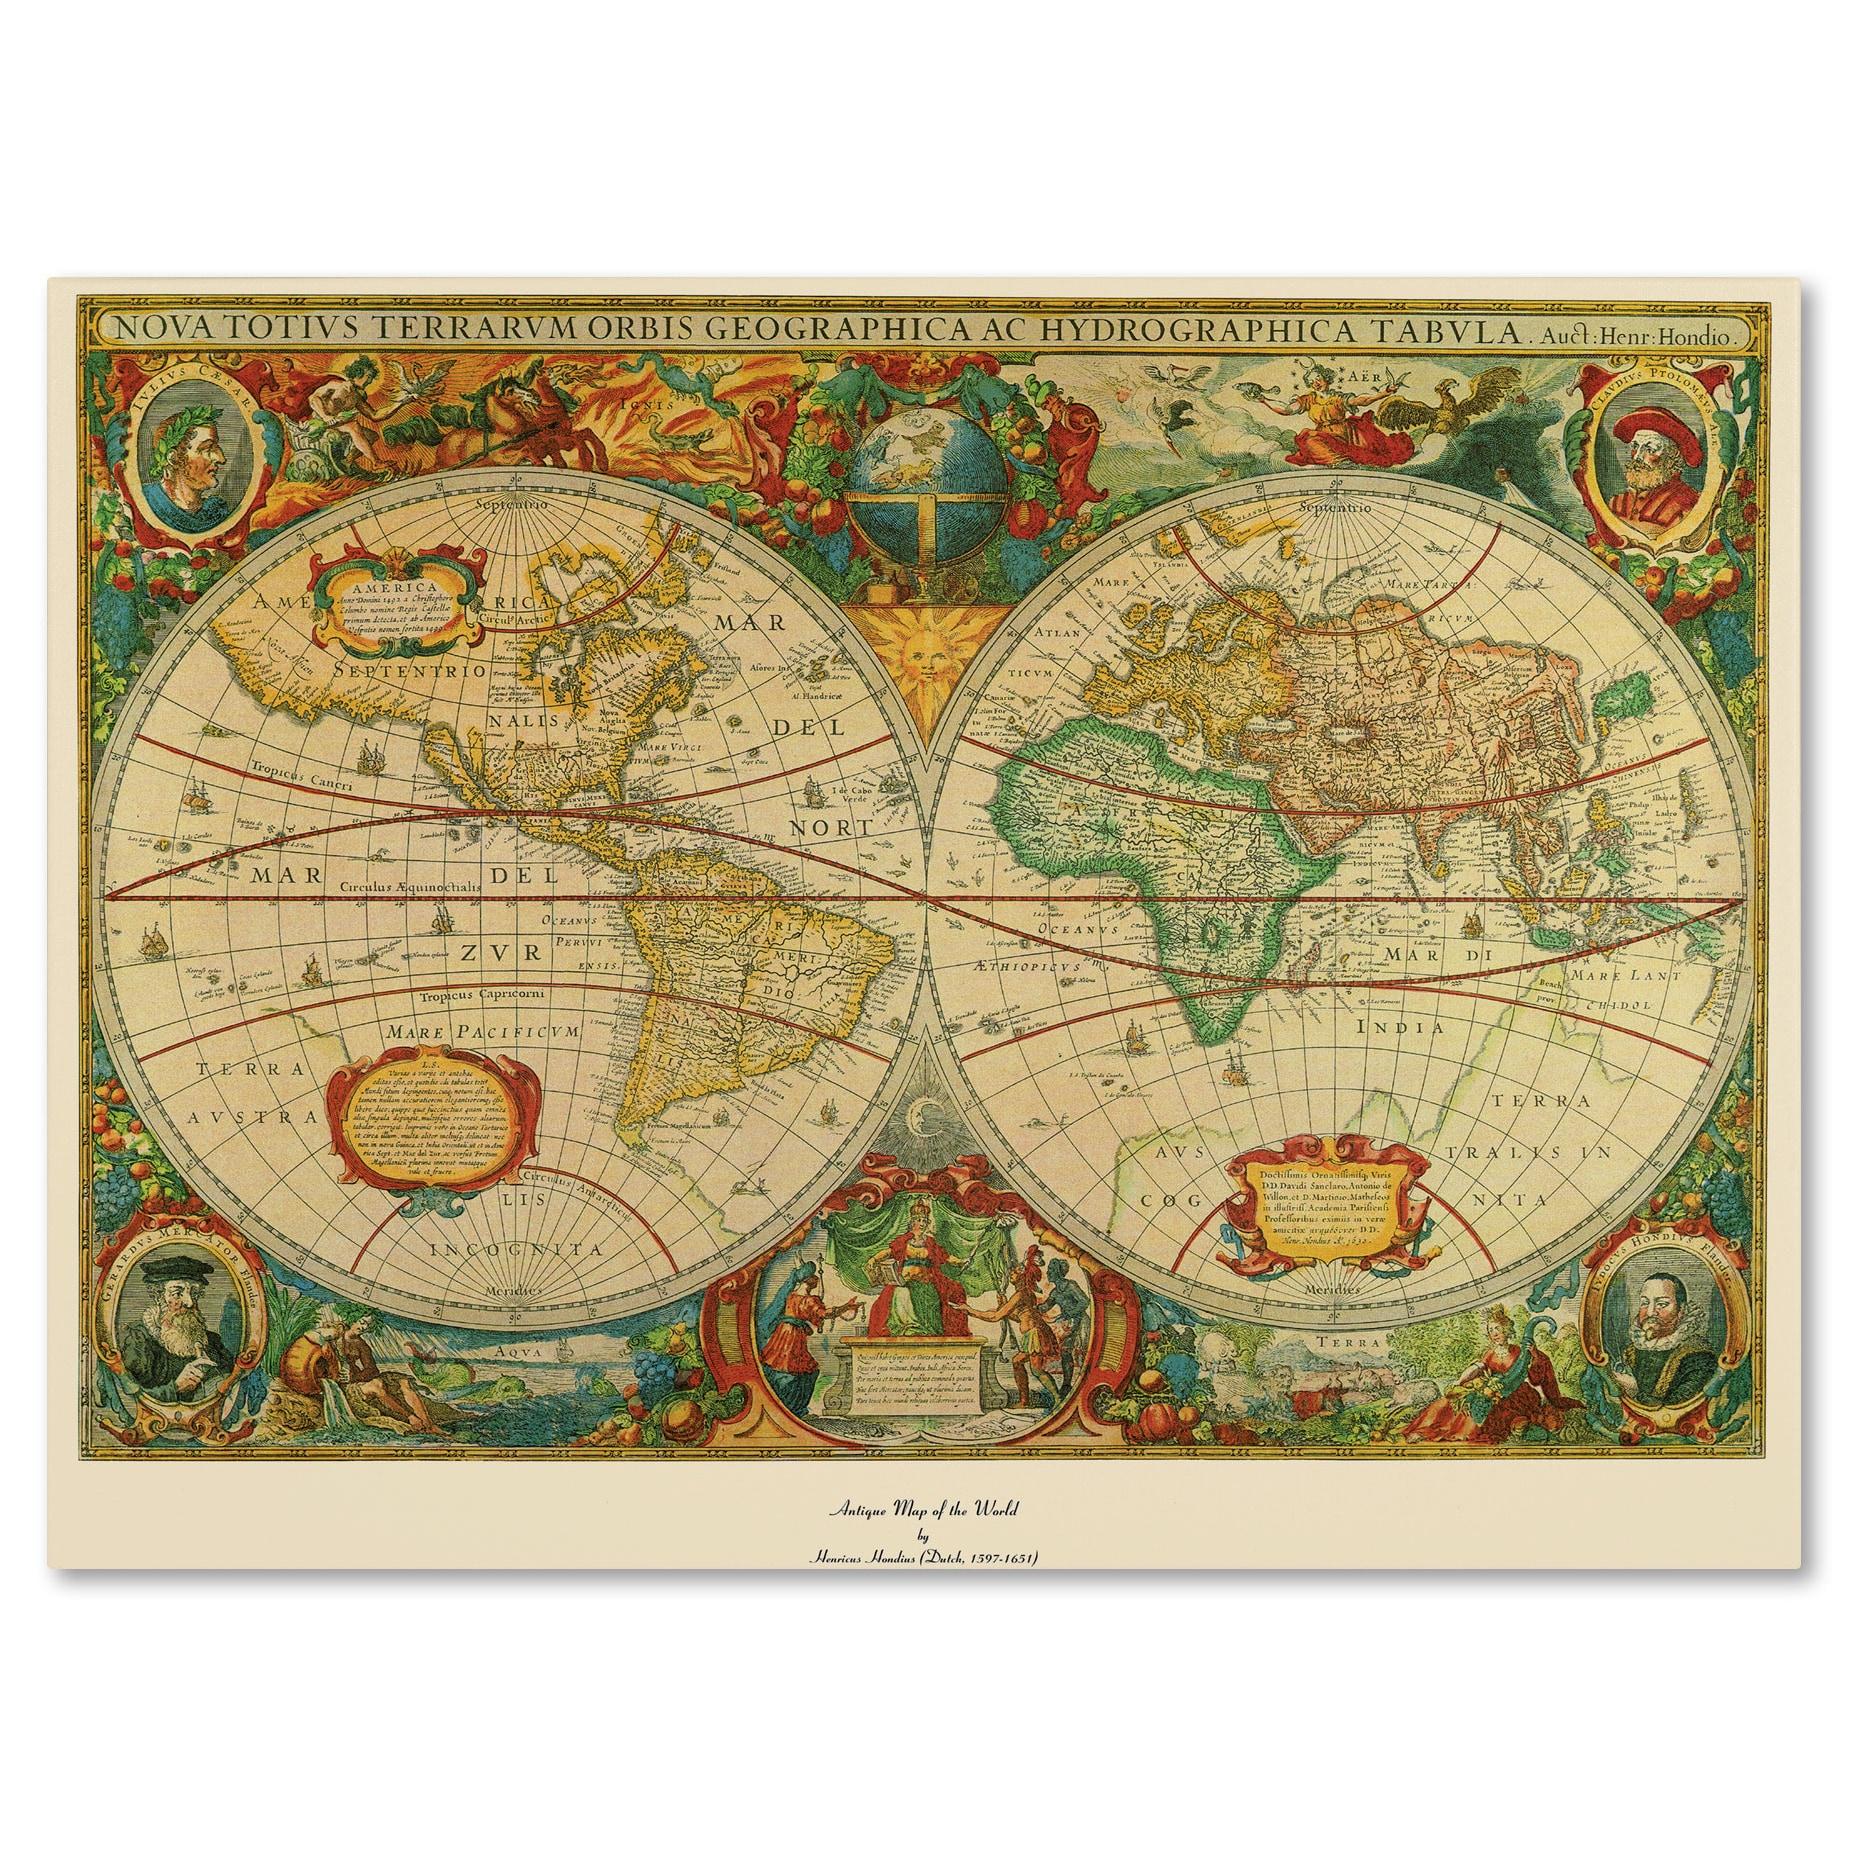 Map Art Gallery | Shop our Best Home Goods Deals Online at Overstock.com